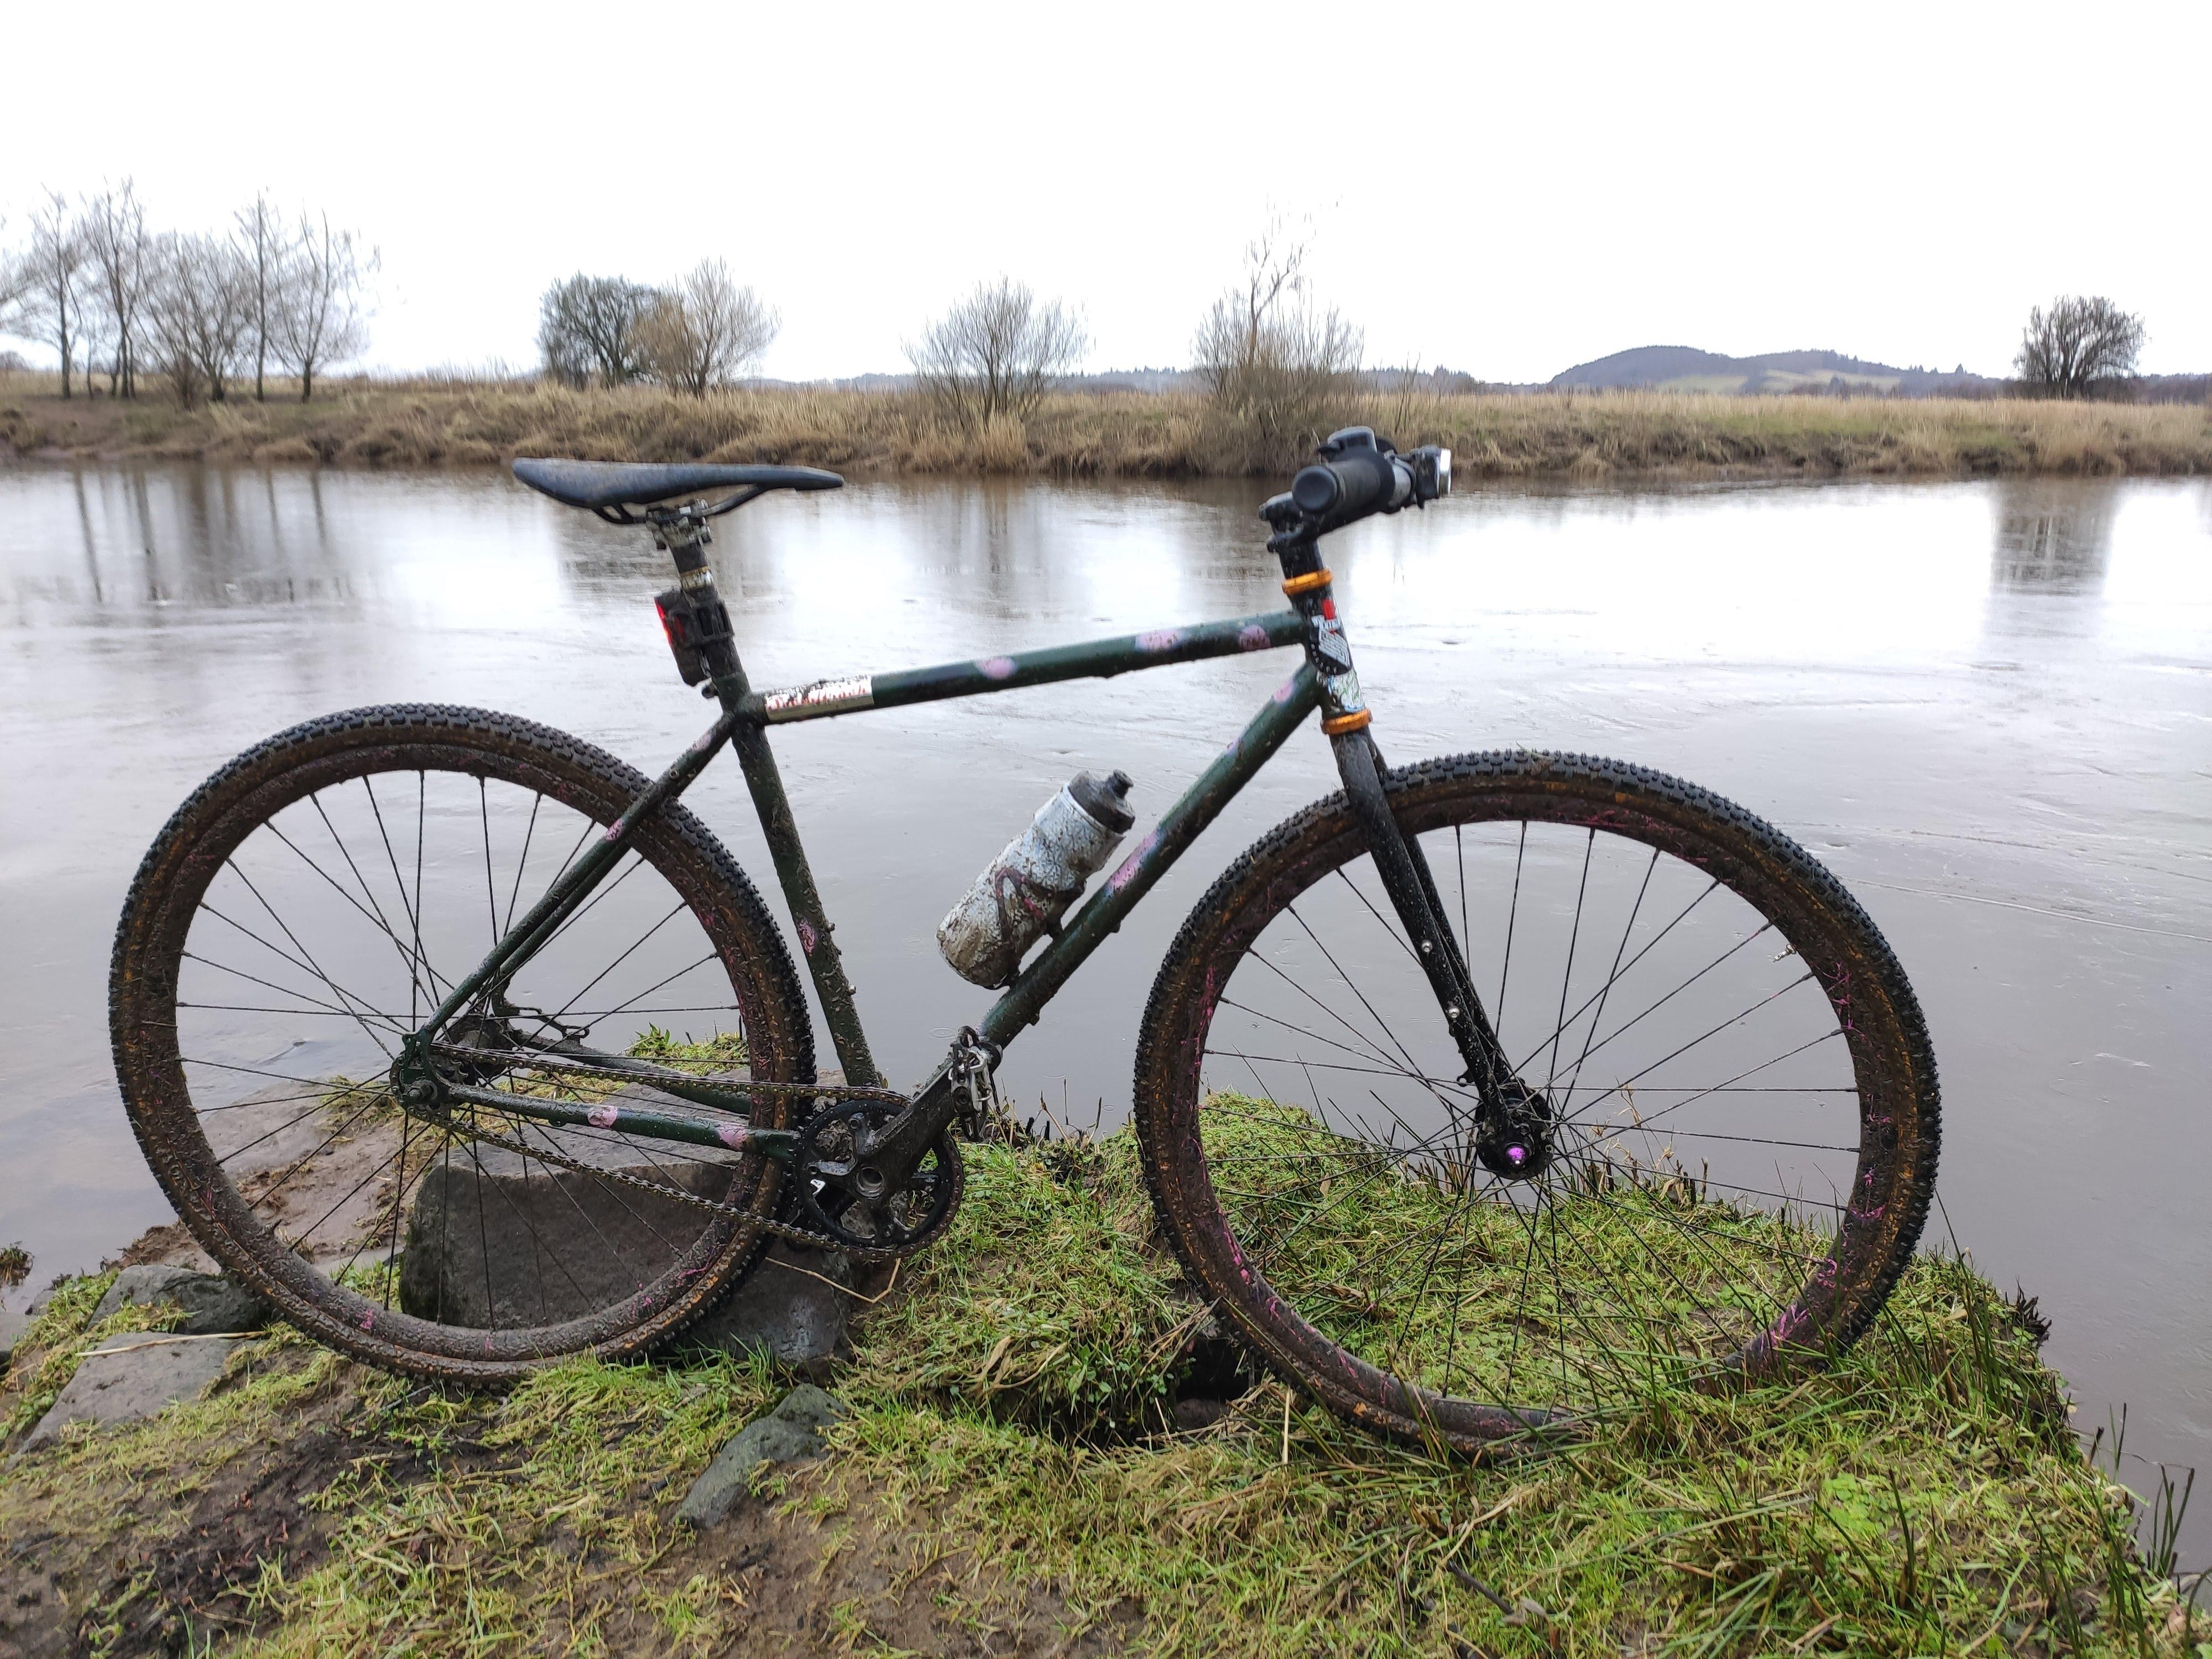 muddy tracklocross bike by river